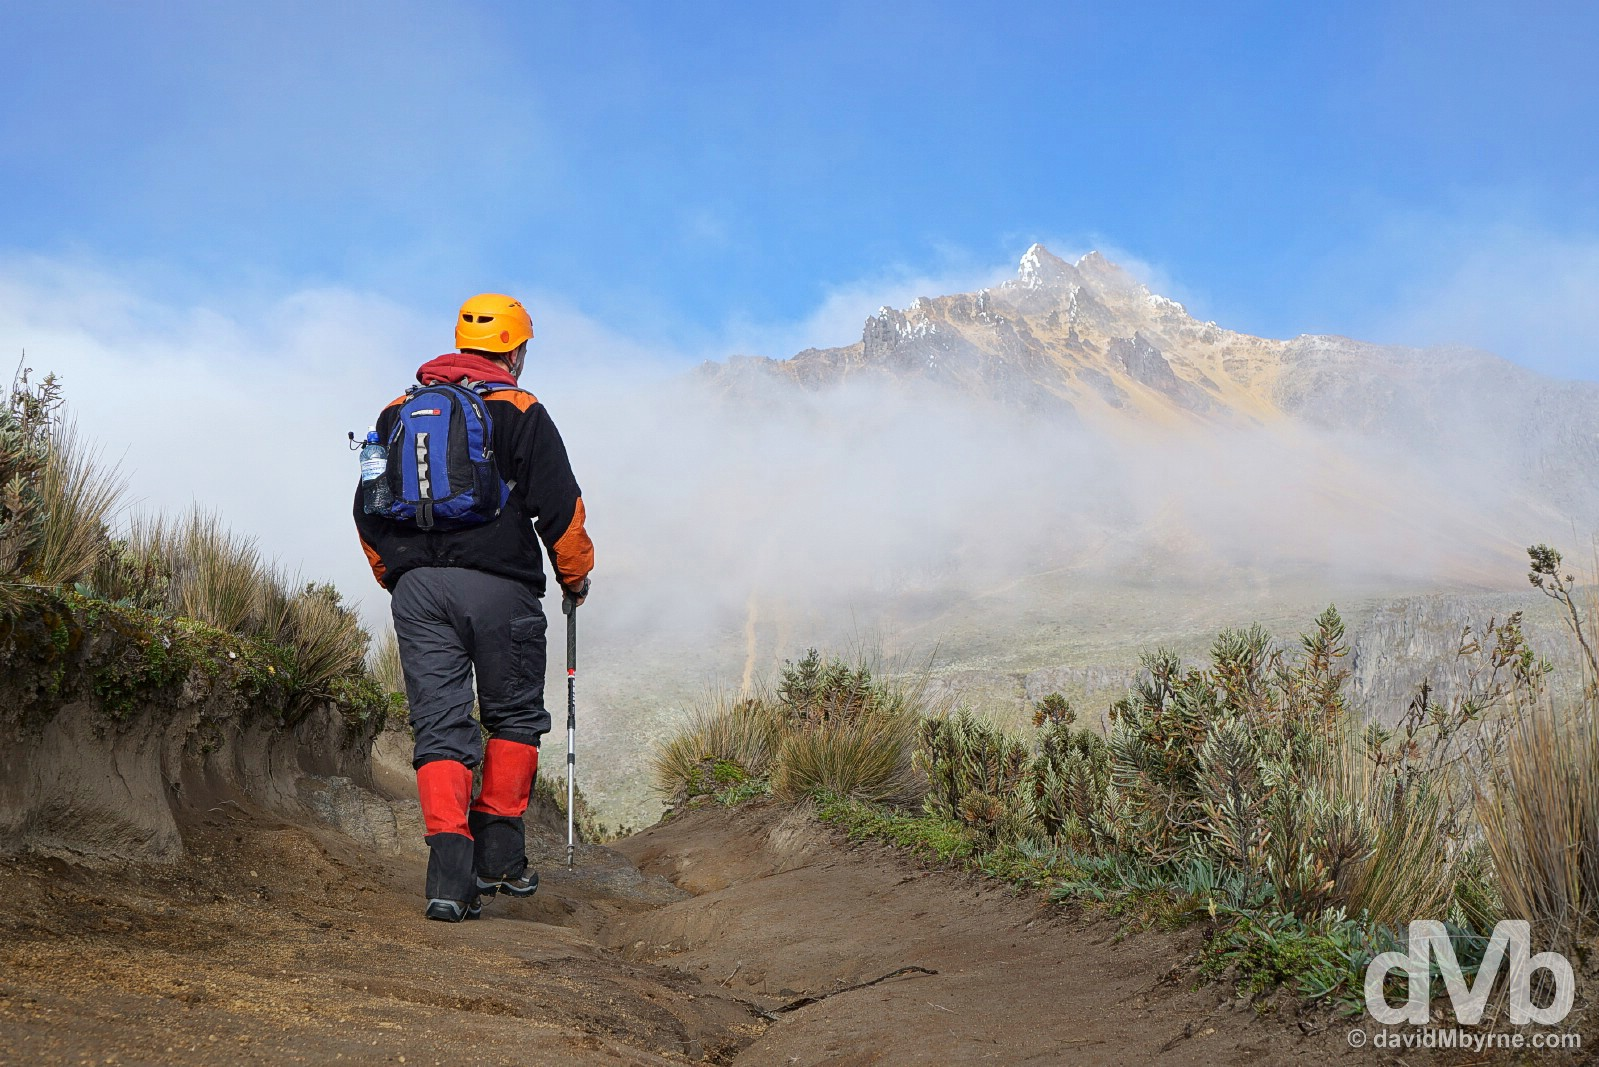 Forty-five minutes in. Heading for Iliniza Norte (seen in the distance) in Reserva Ecologica Los Ilinizas, Ecuador. July 7, 2015.